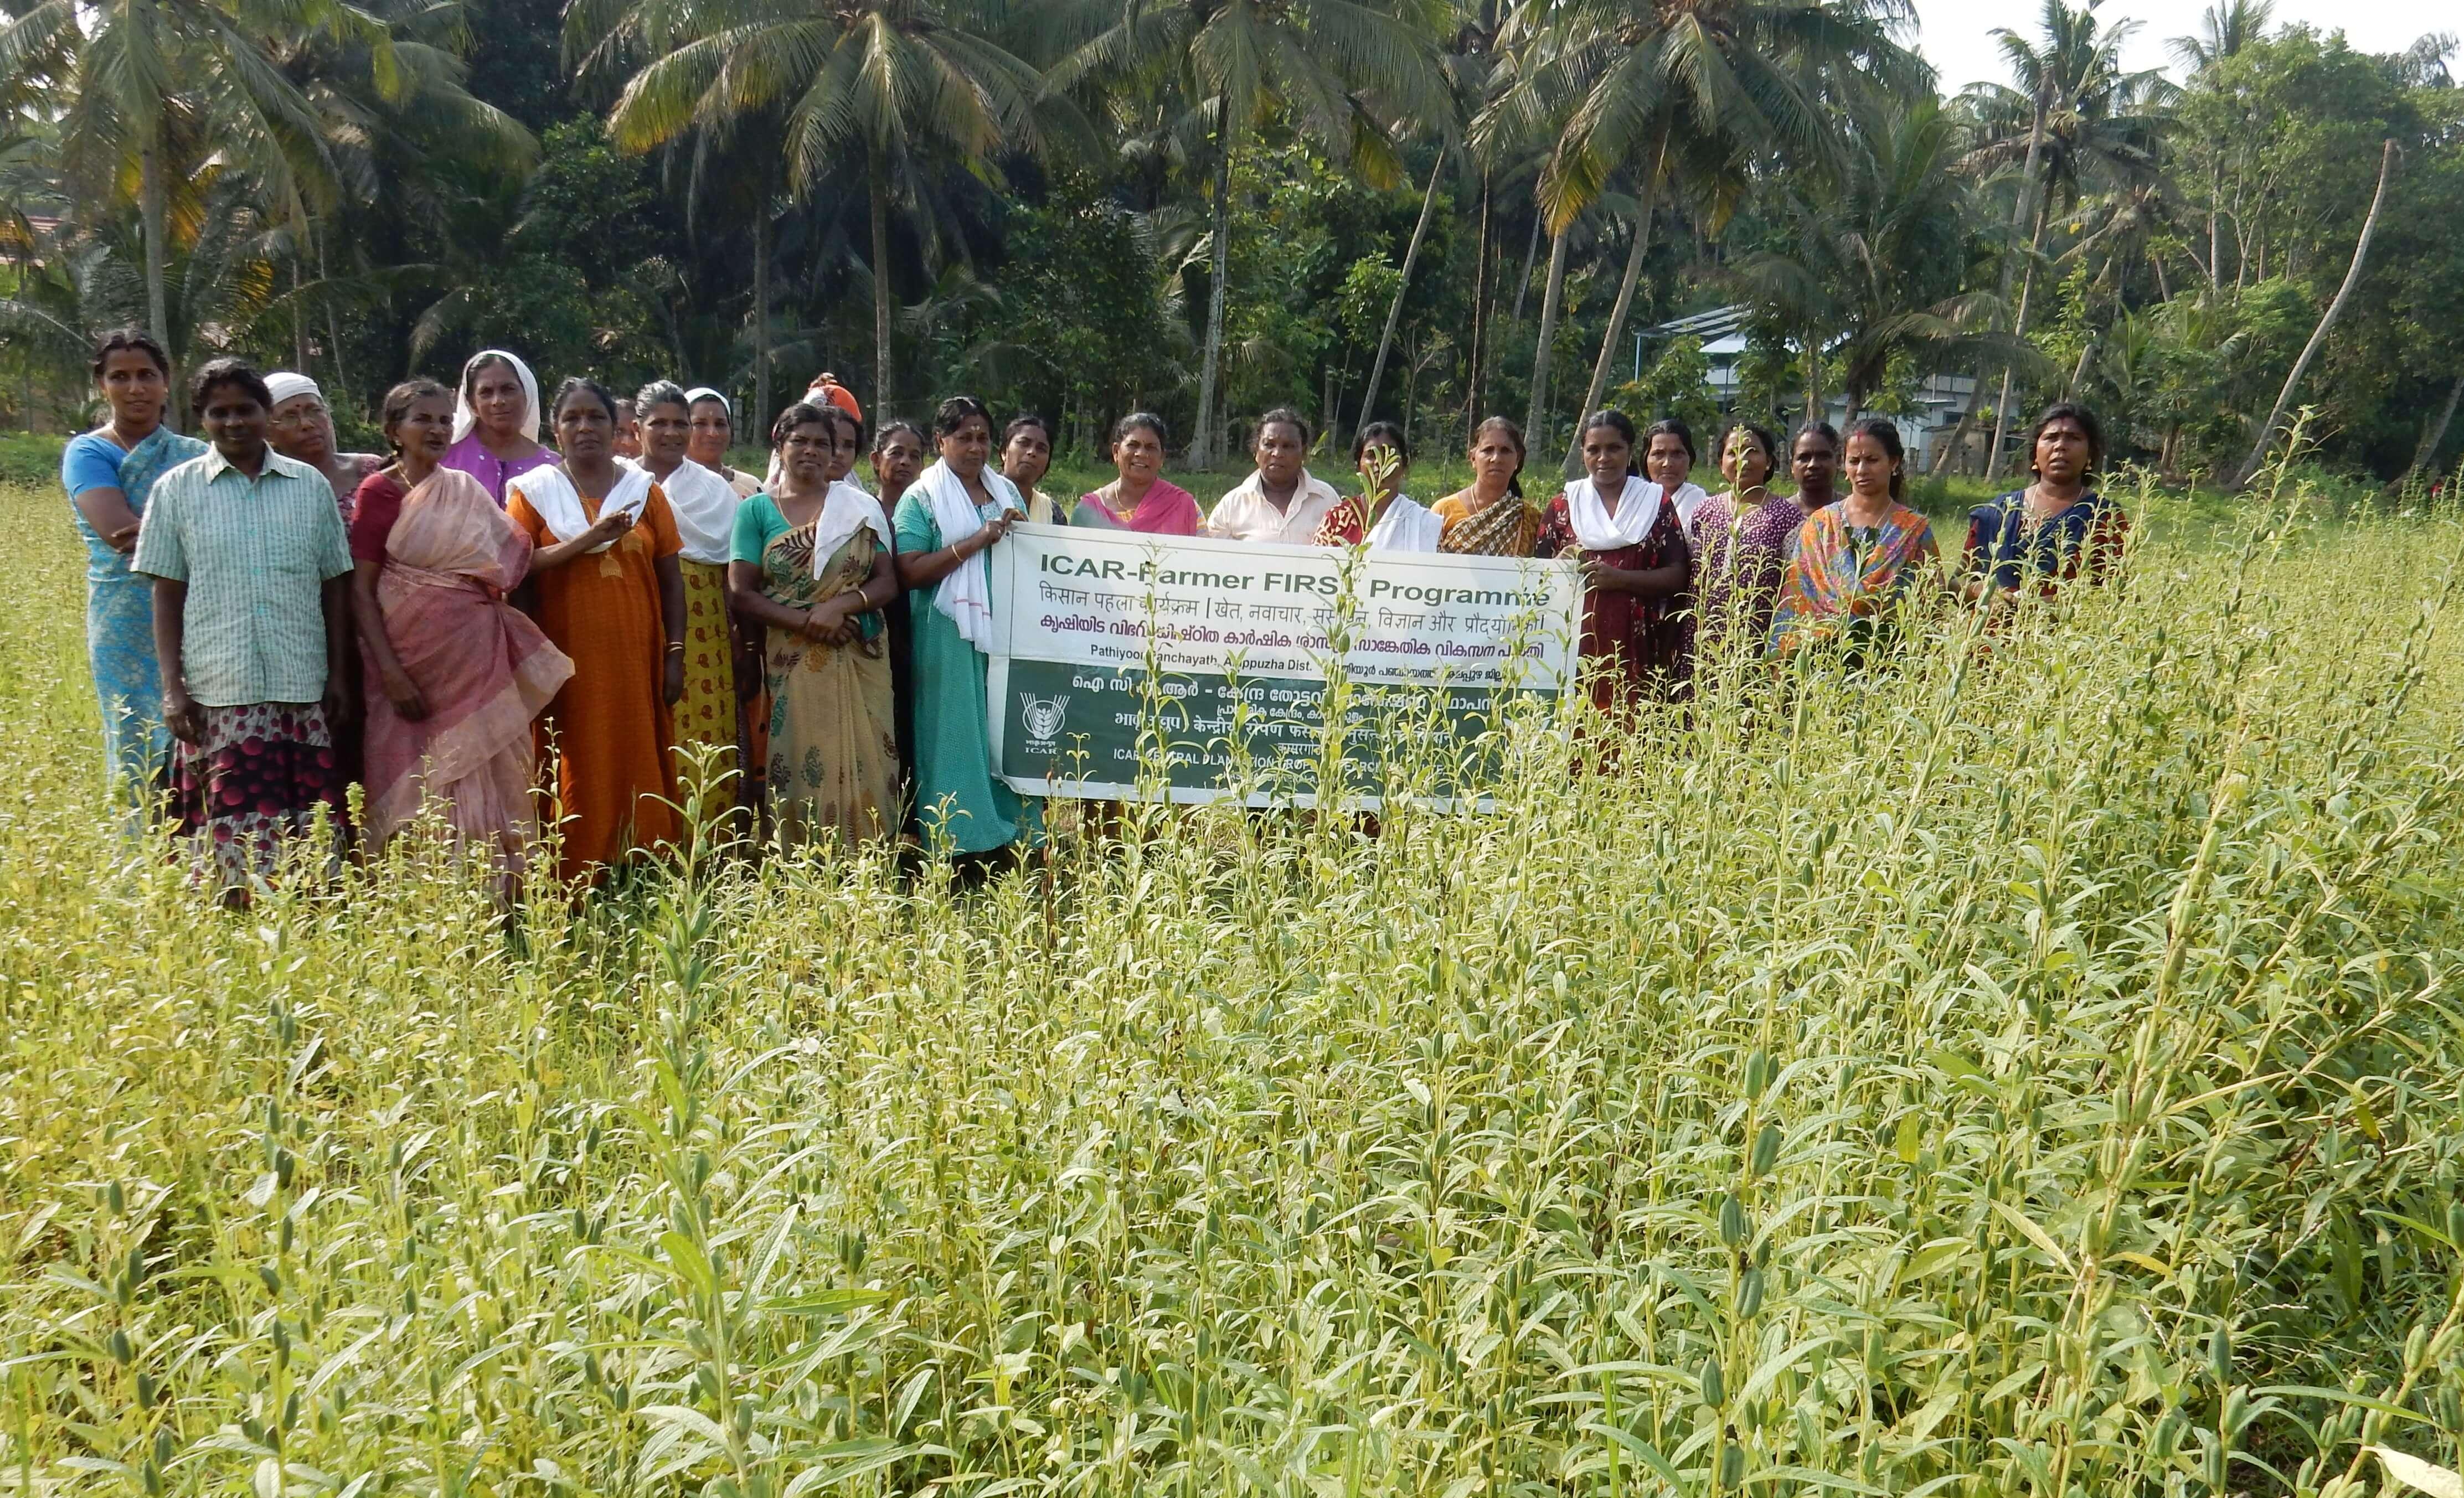 Revived the niche crop – Onattukara Sesamum by women MGNREGS groups through FFP convergence